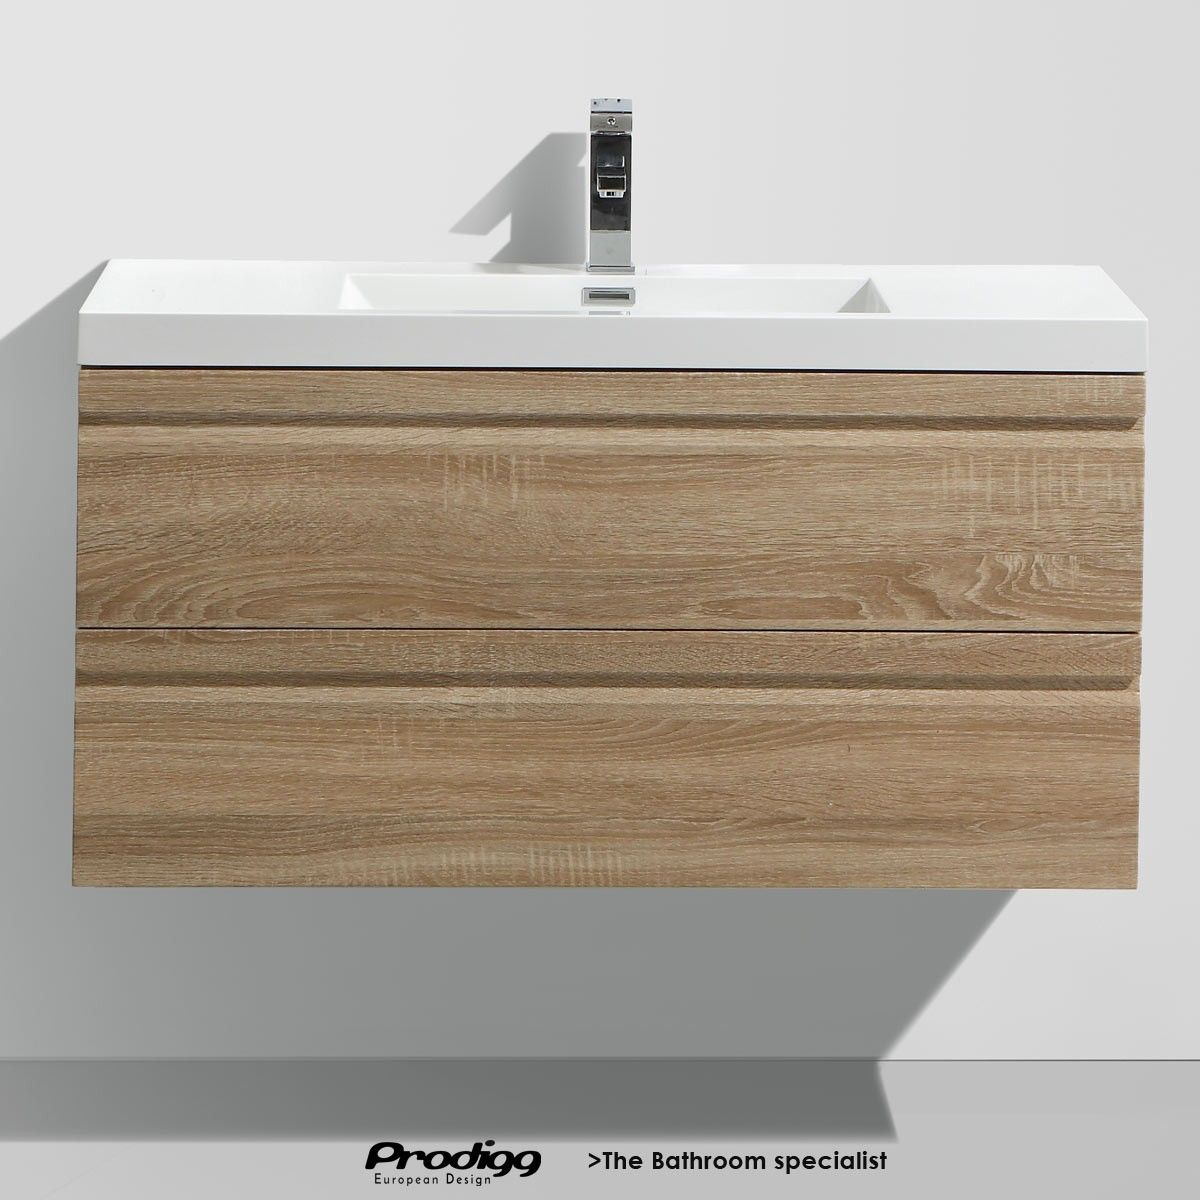 Bathroom vanities sydney wholesale - Cheap Prices Concave Wall Hung Vanity Bathroom Pvc Moisture Resistant Sydney Show Room Online Prodigg Bathroom Mirrors Sydney Australia Wide Delivery